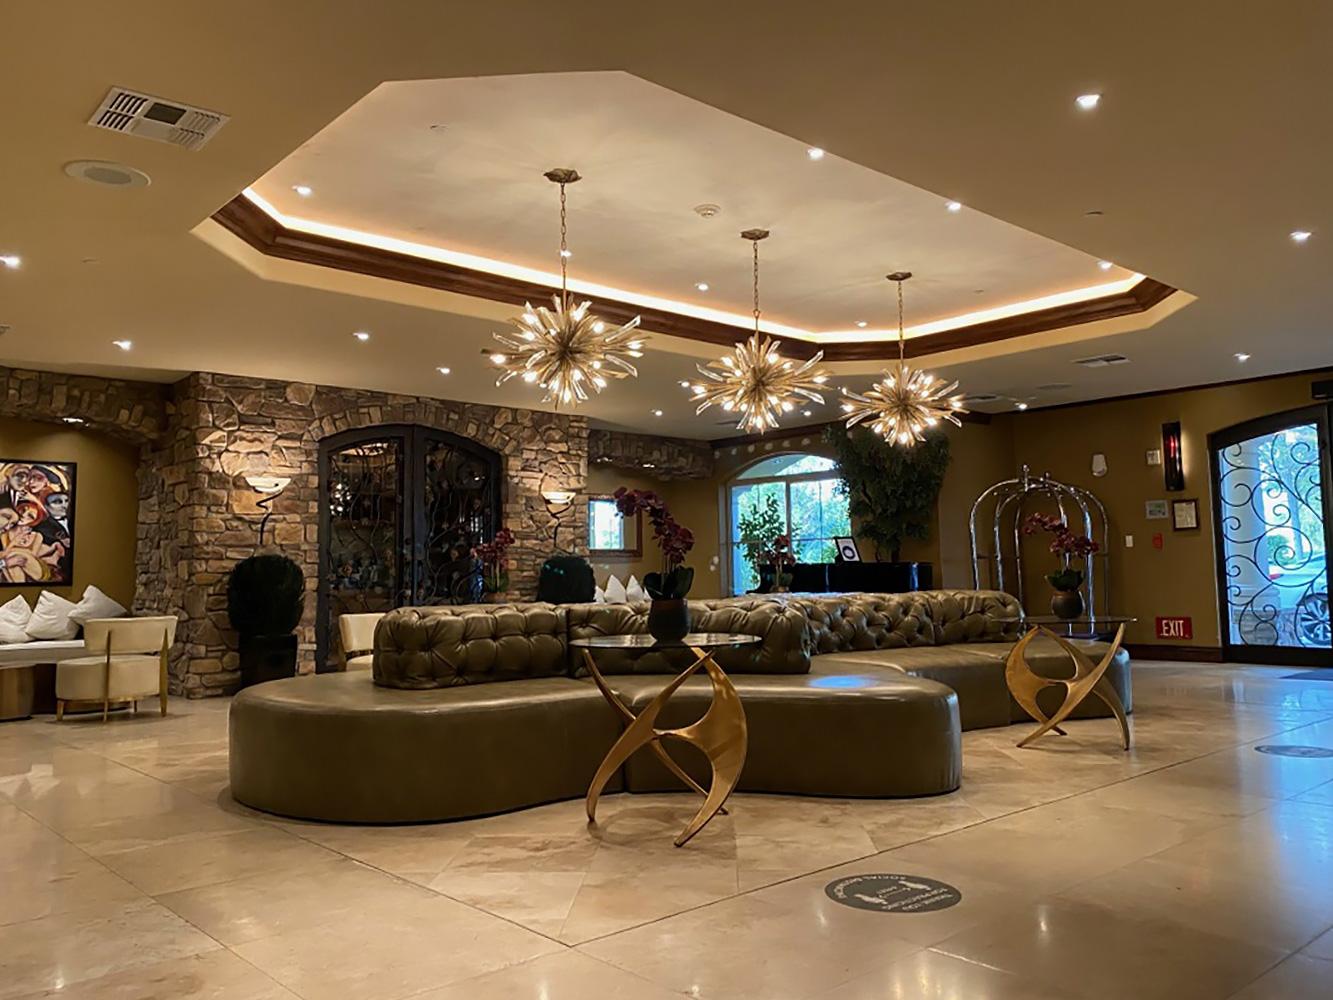 hotel-labellasera_acropolis-lighting_1000px_1